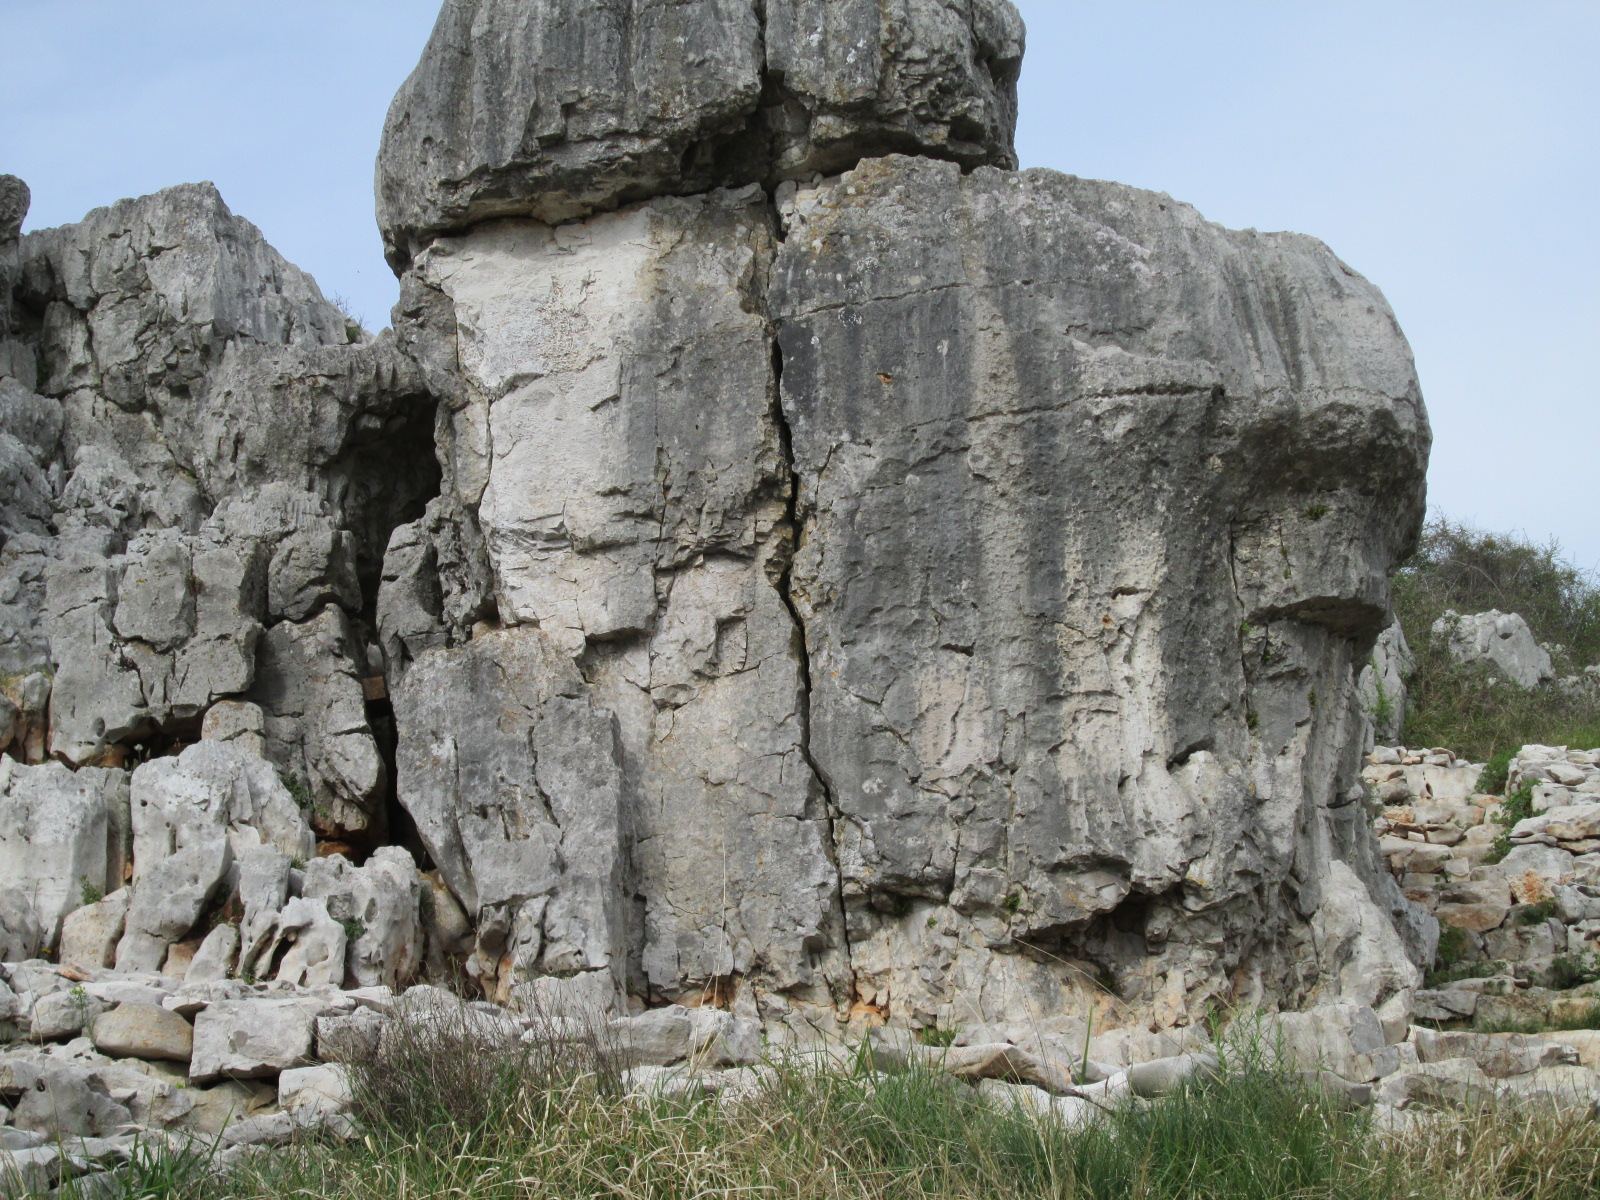 Sas De San Belin analisi geobiologica 0809